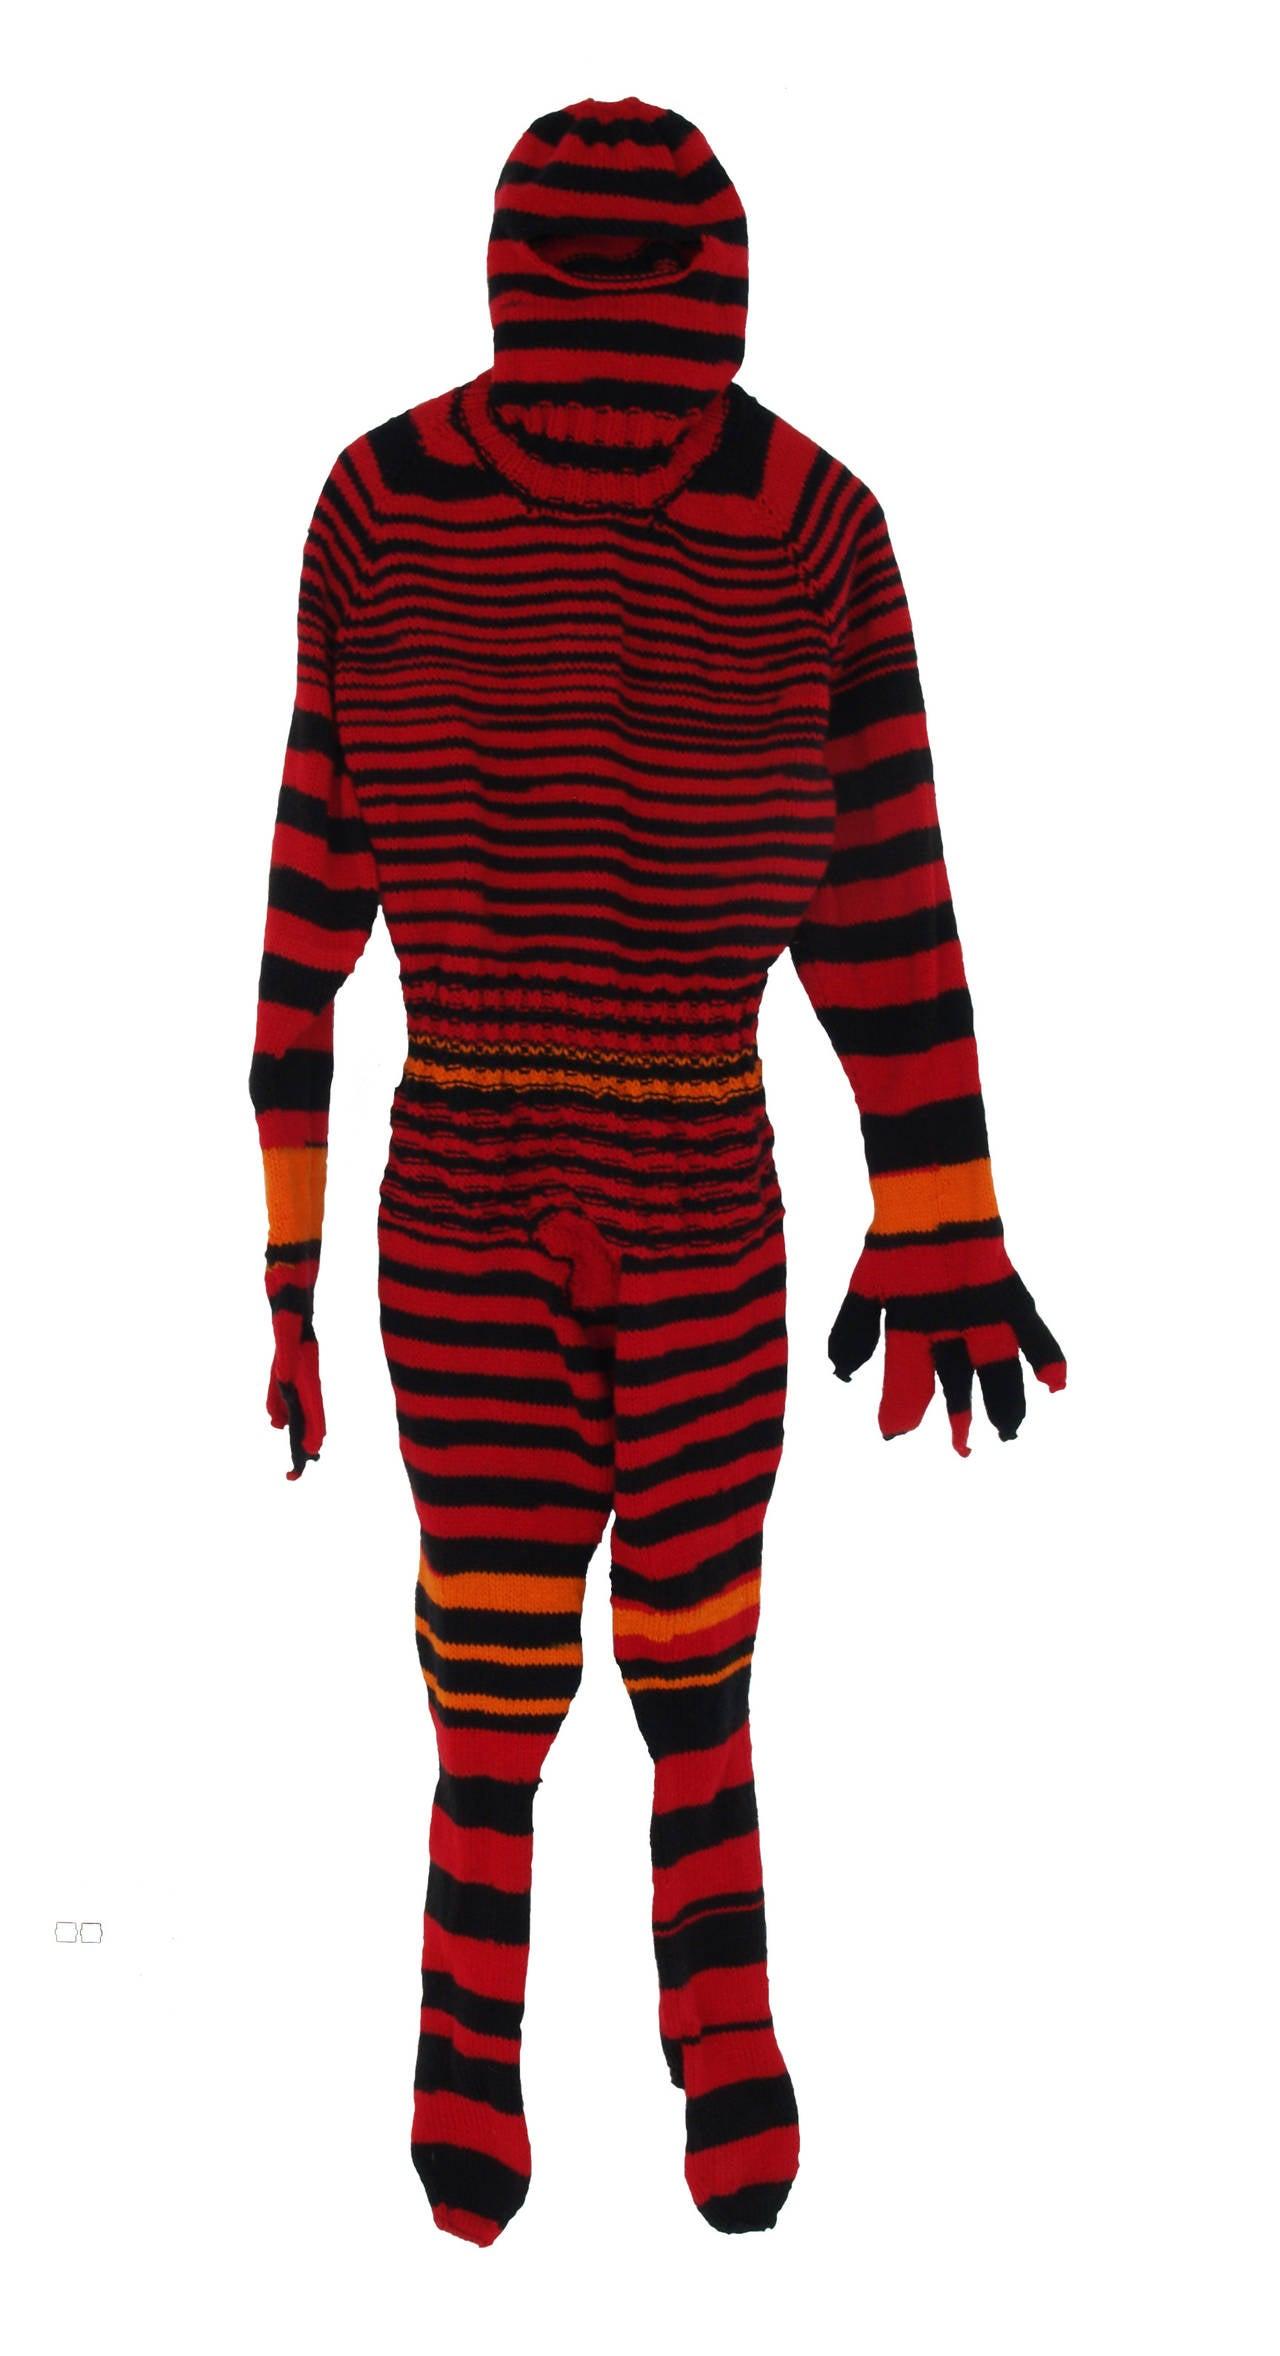 """Spiritman 3"", Contemporary, Fine Craft, Pattern, Stripes, Hand Knit, Fiber"